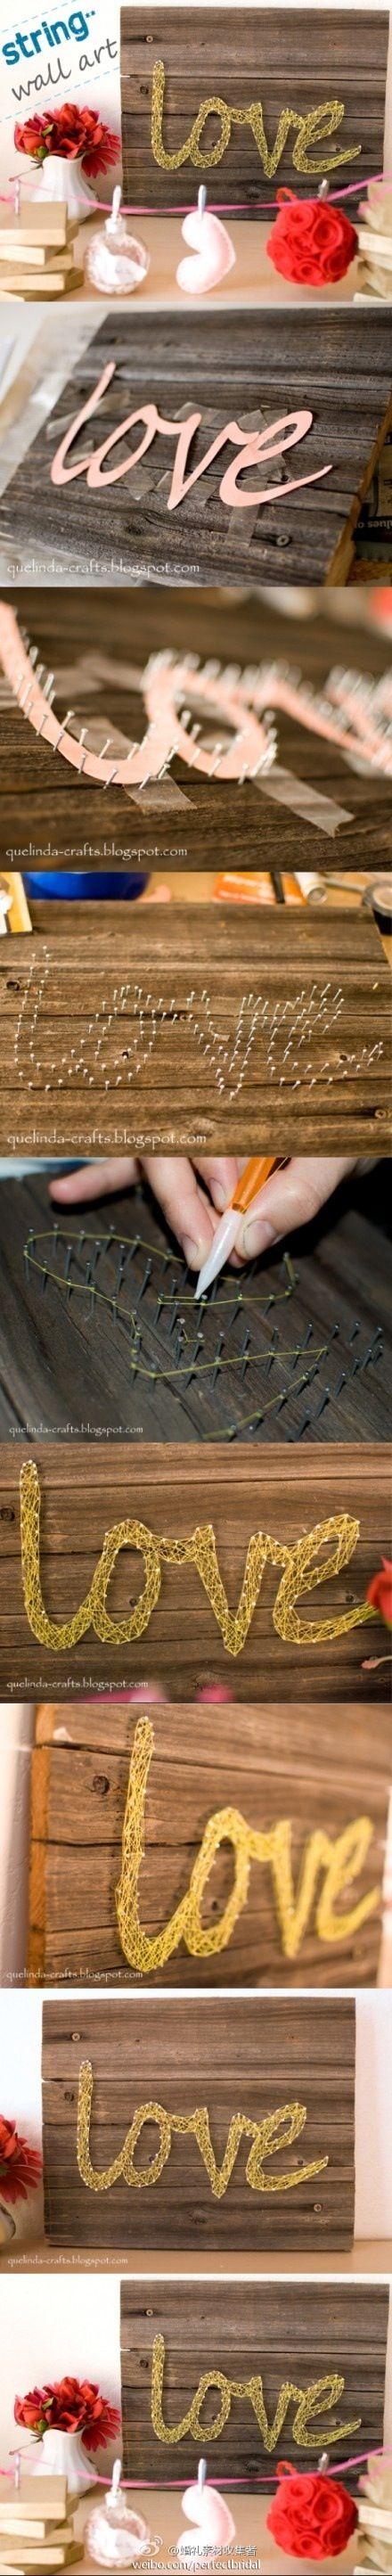 String word art tutorial